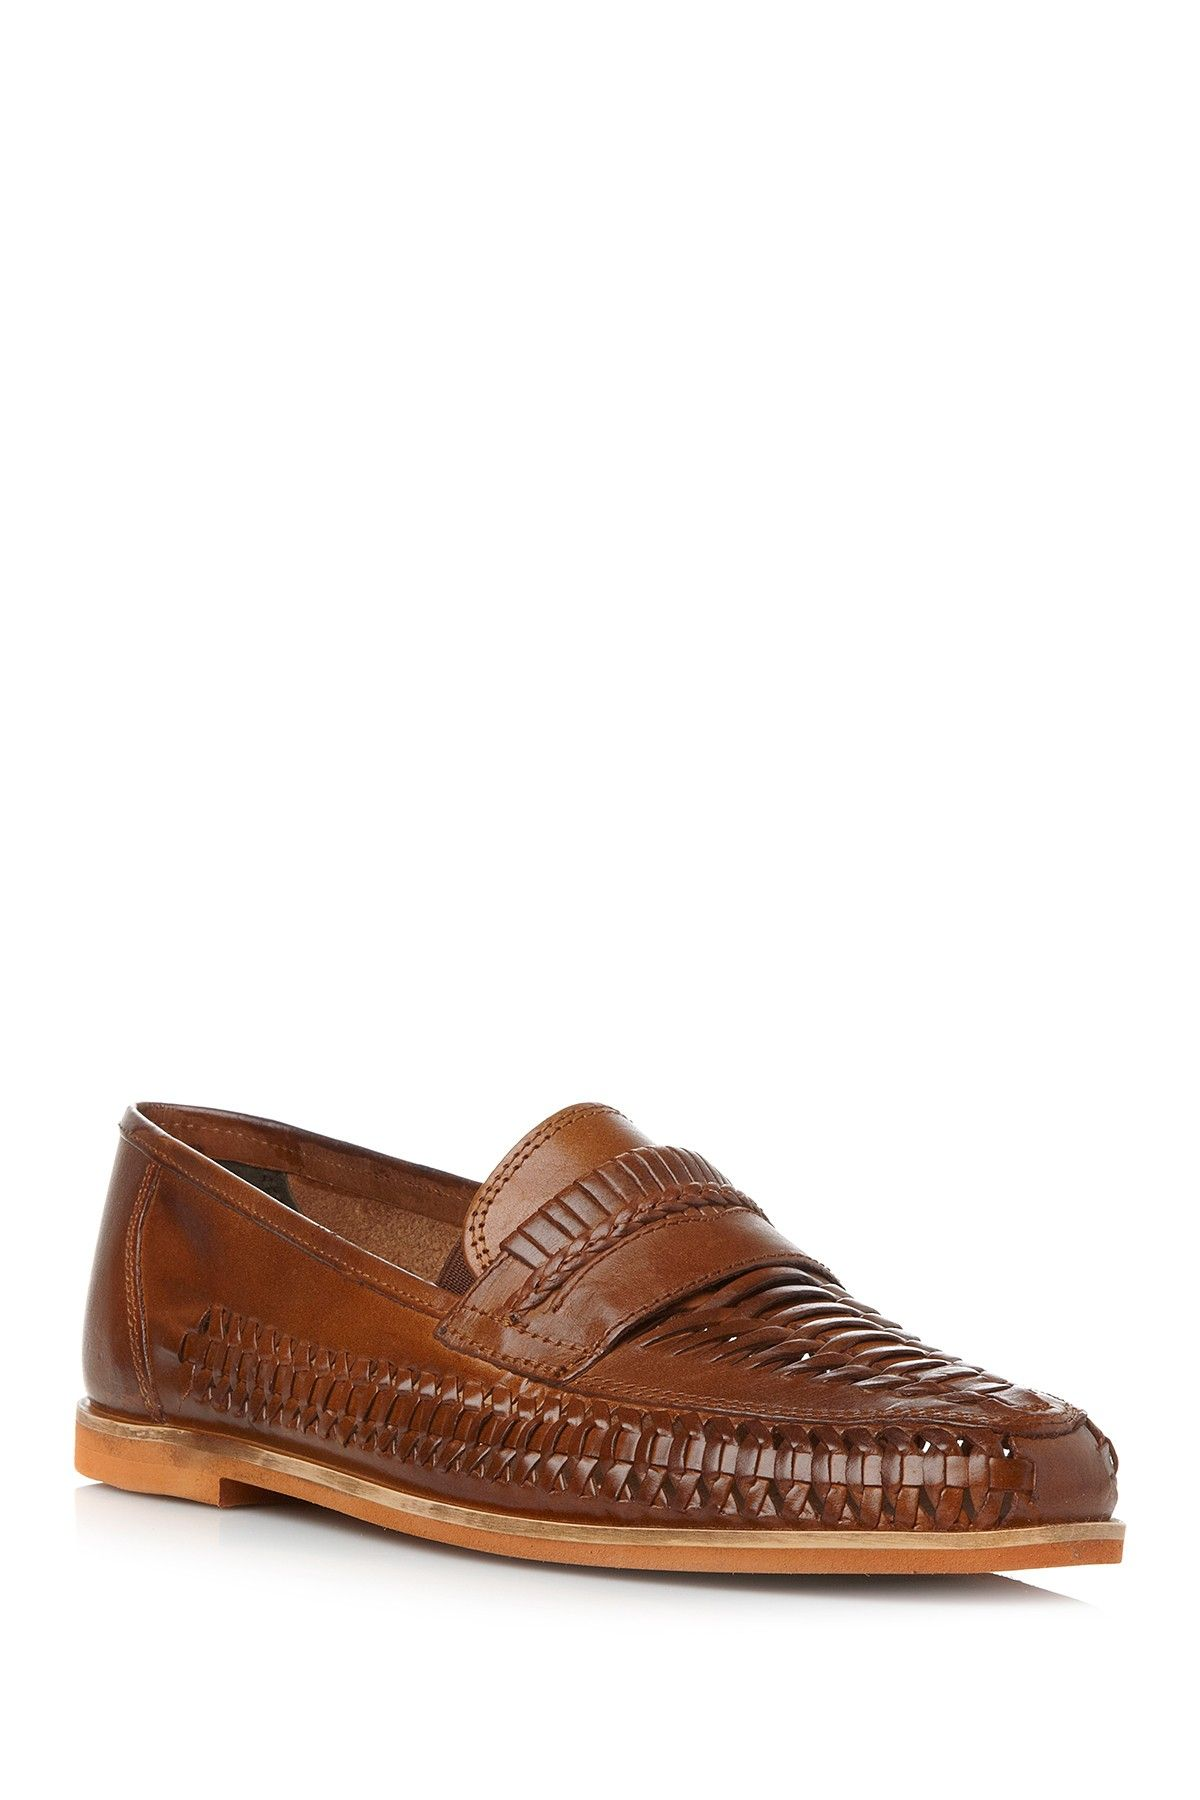 9aa5138e699b16 Brighton Rock Woven Loafer on HauteLook | style o mine | Shoes, Shoe ...